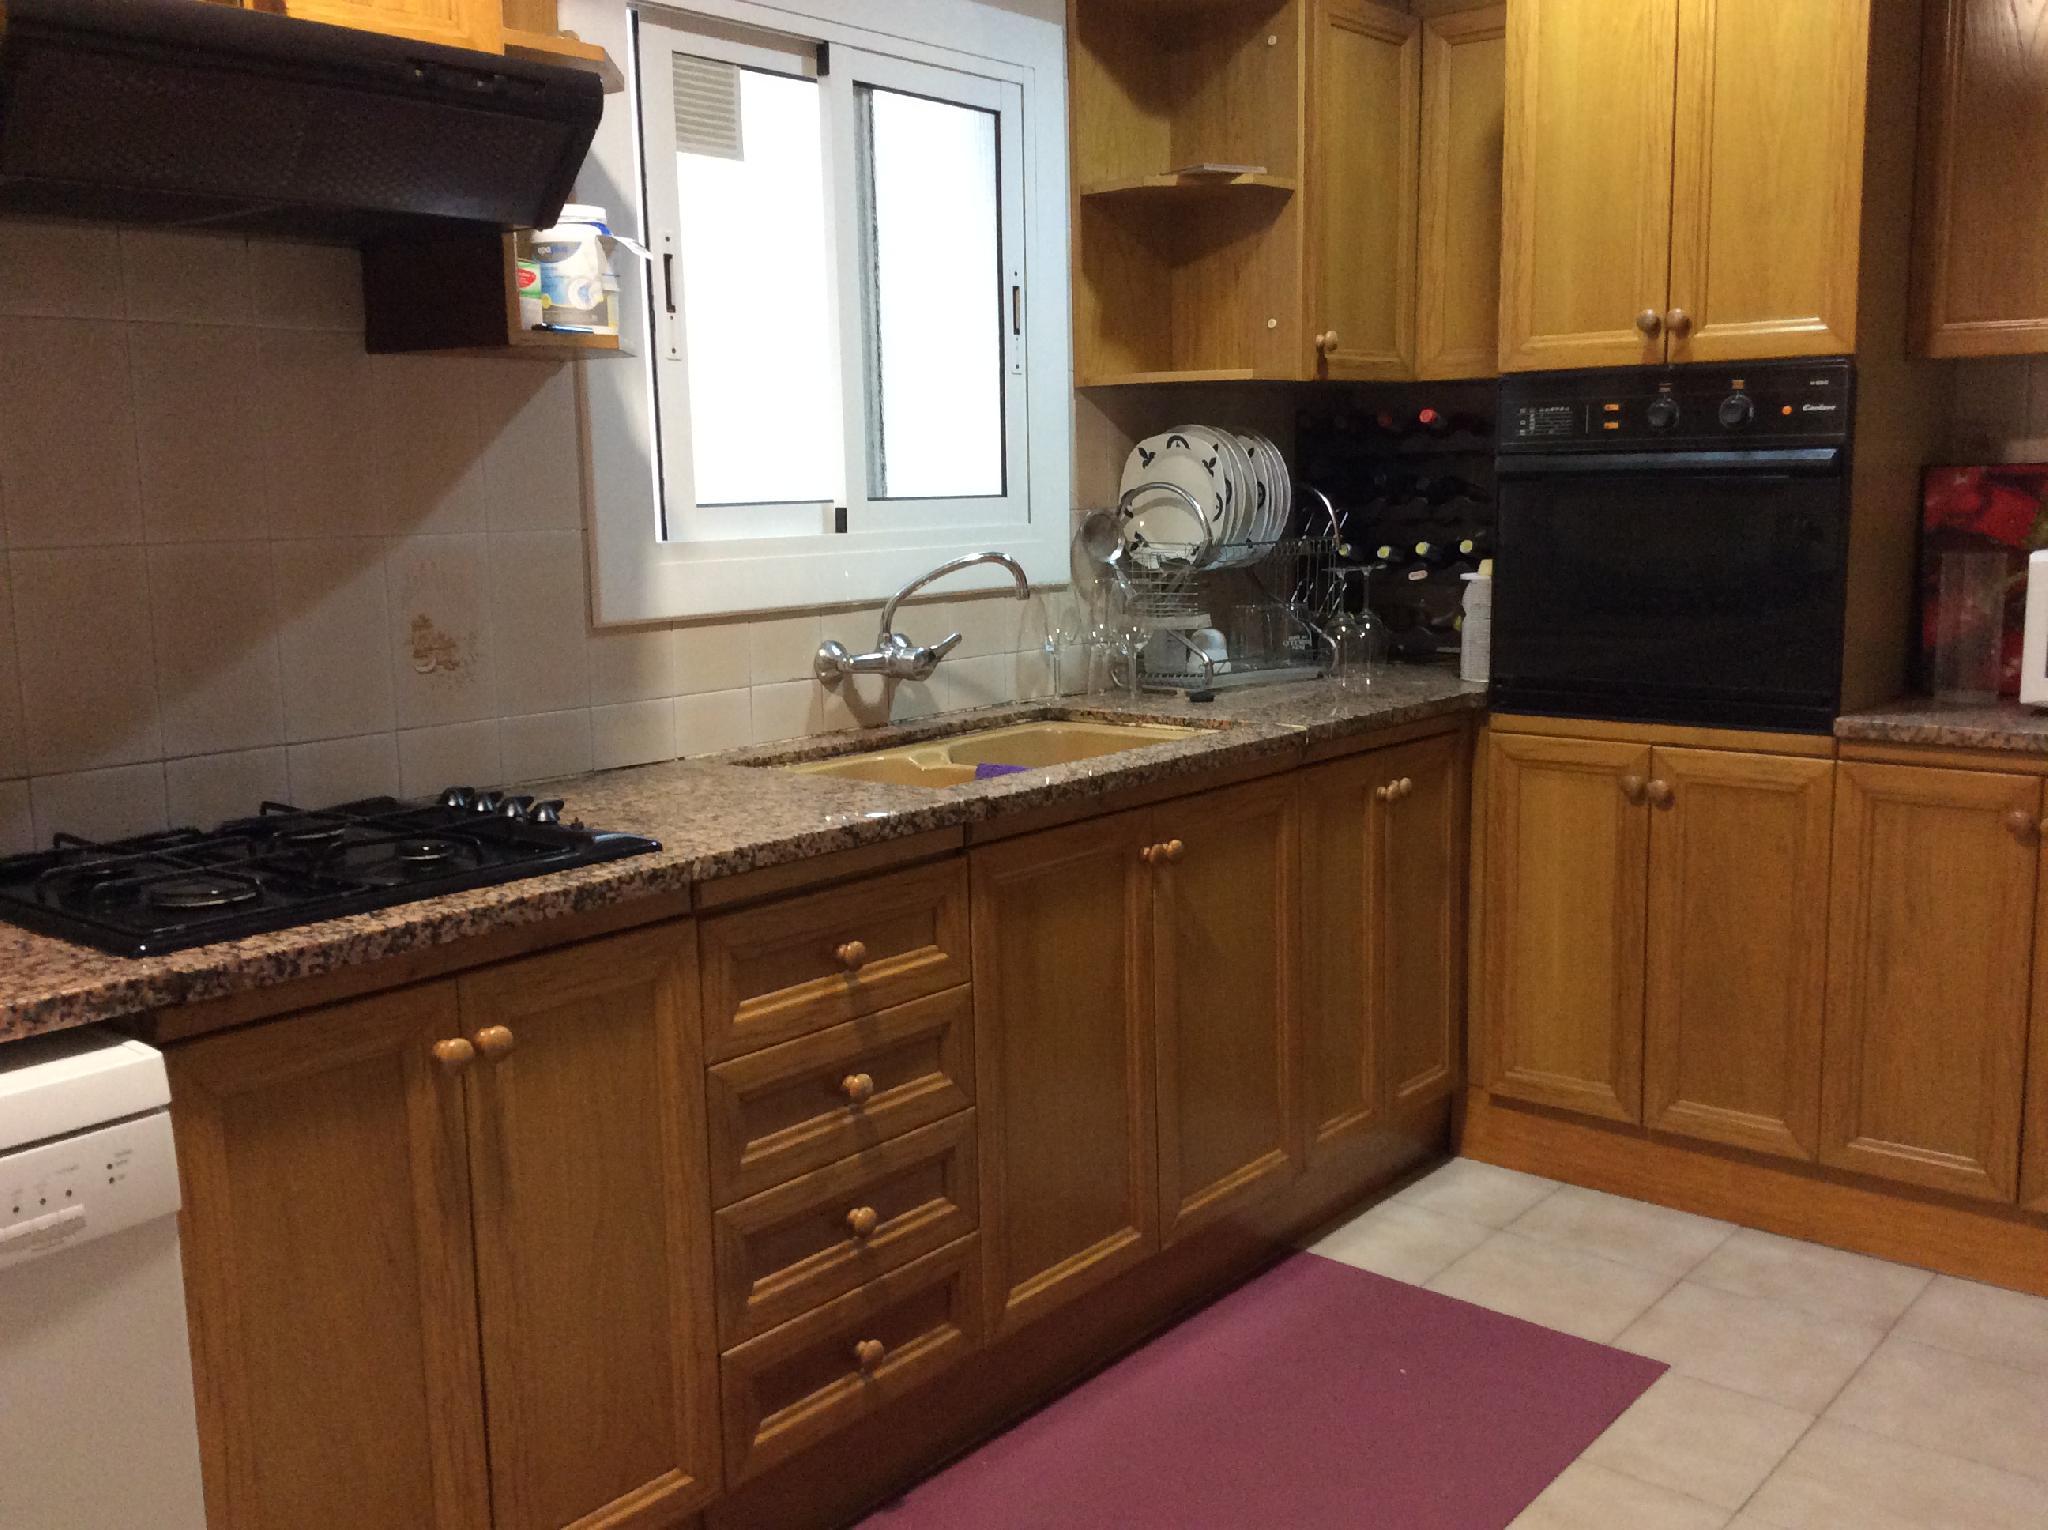 petit-appartement-de-vente-a-calle-murcia-con-espronceda-navas-a-barcelona-215561781